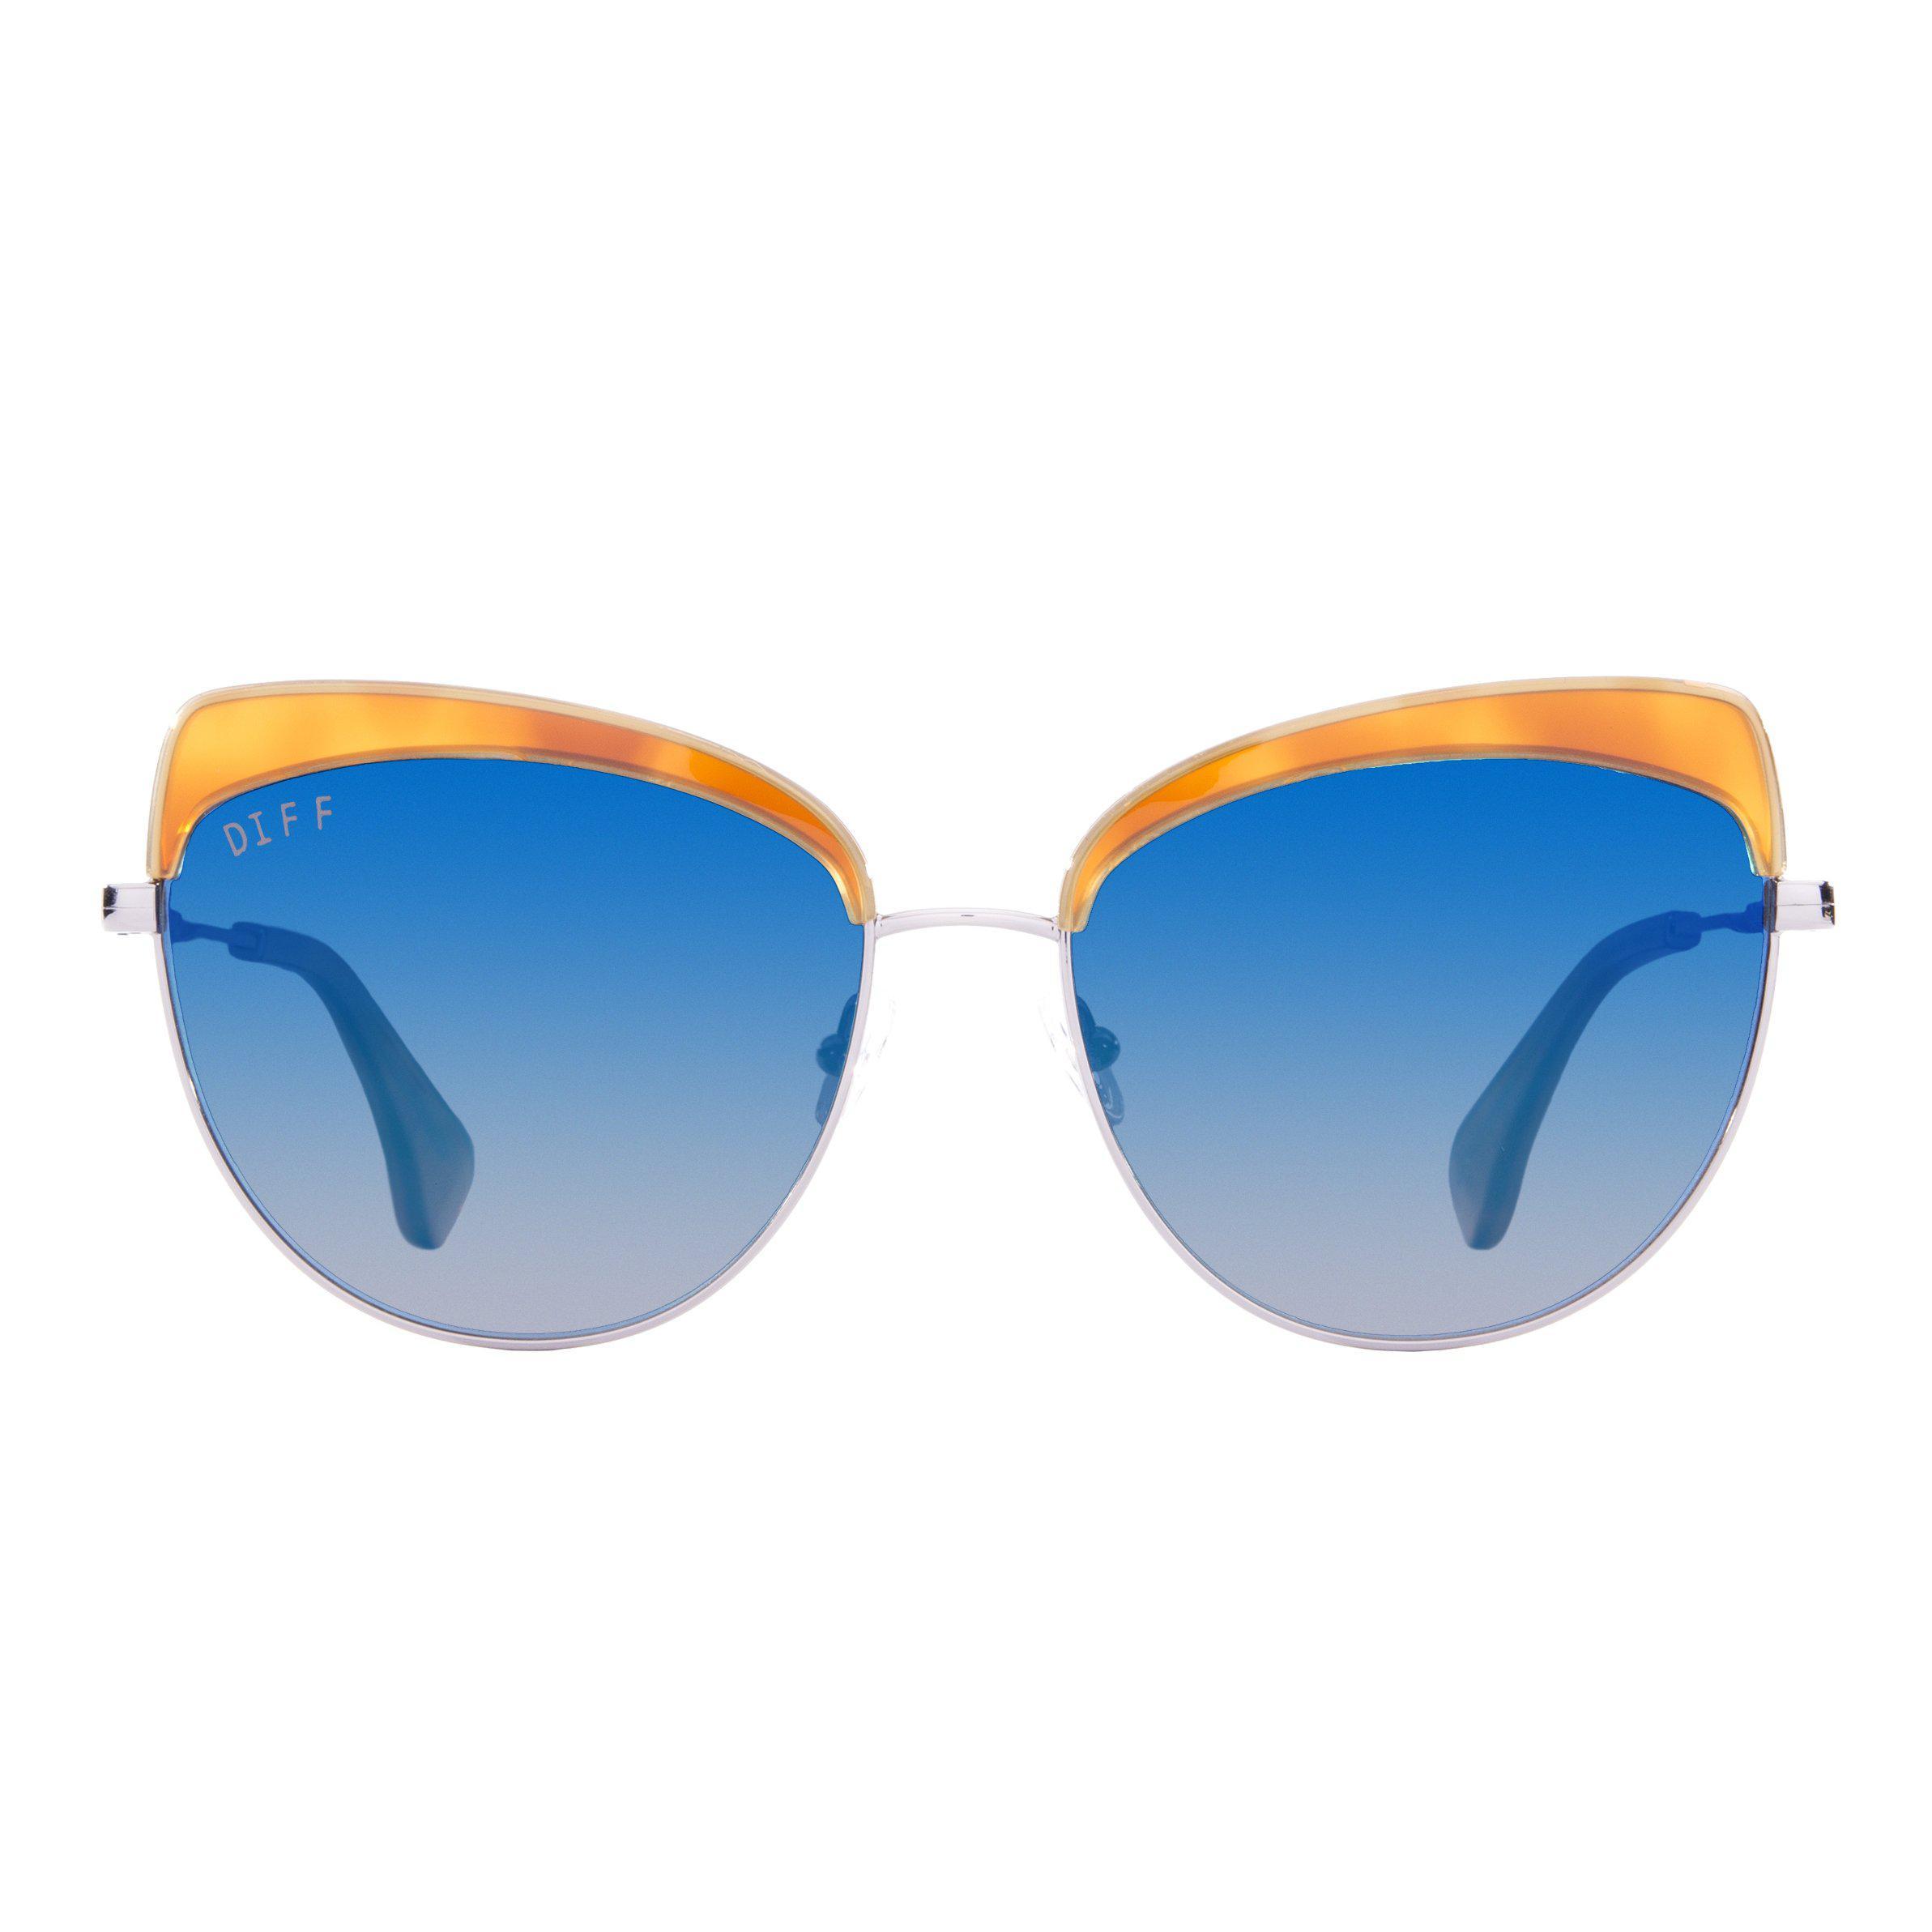 ebe2d2eff93 Lyst - DIFF Izzy - Honey Tortoise Light Gunmetal + Blue Flash + ...